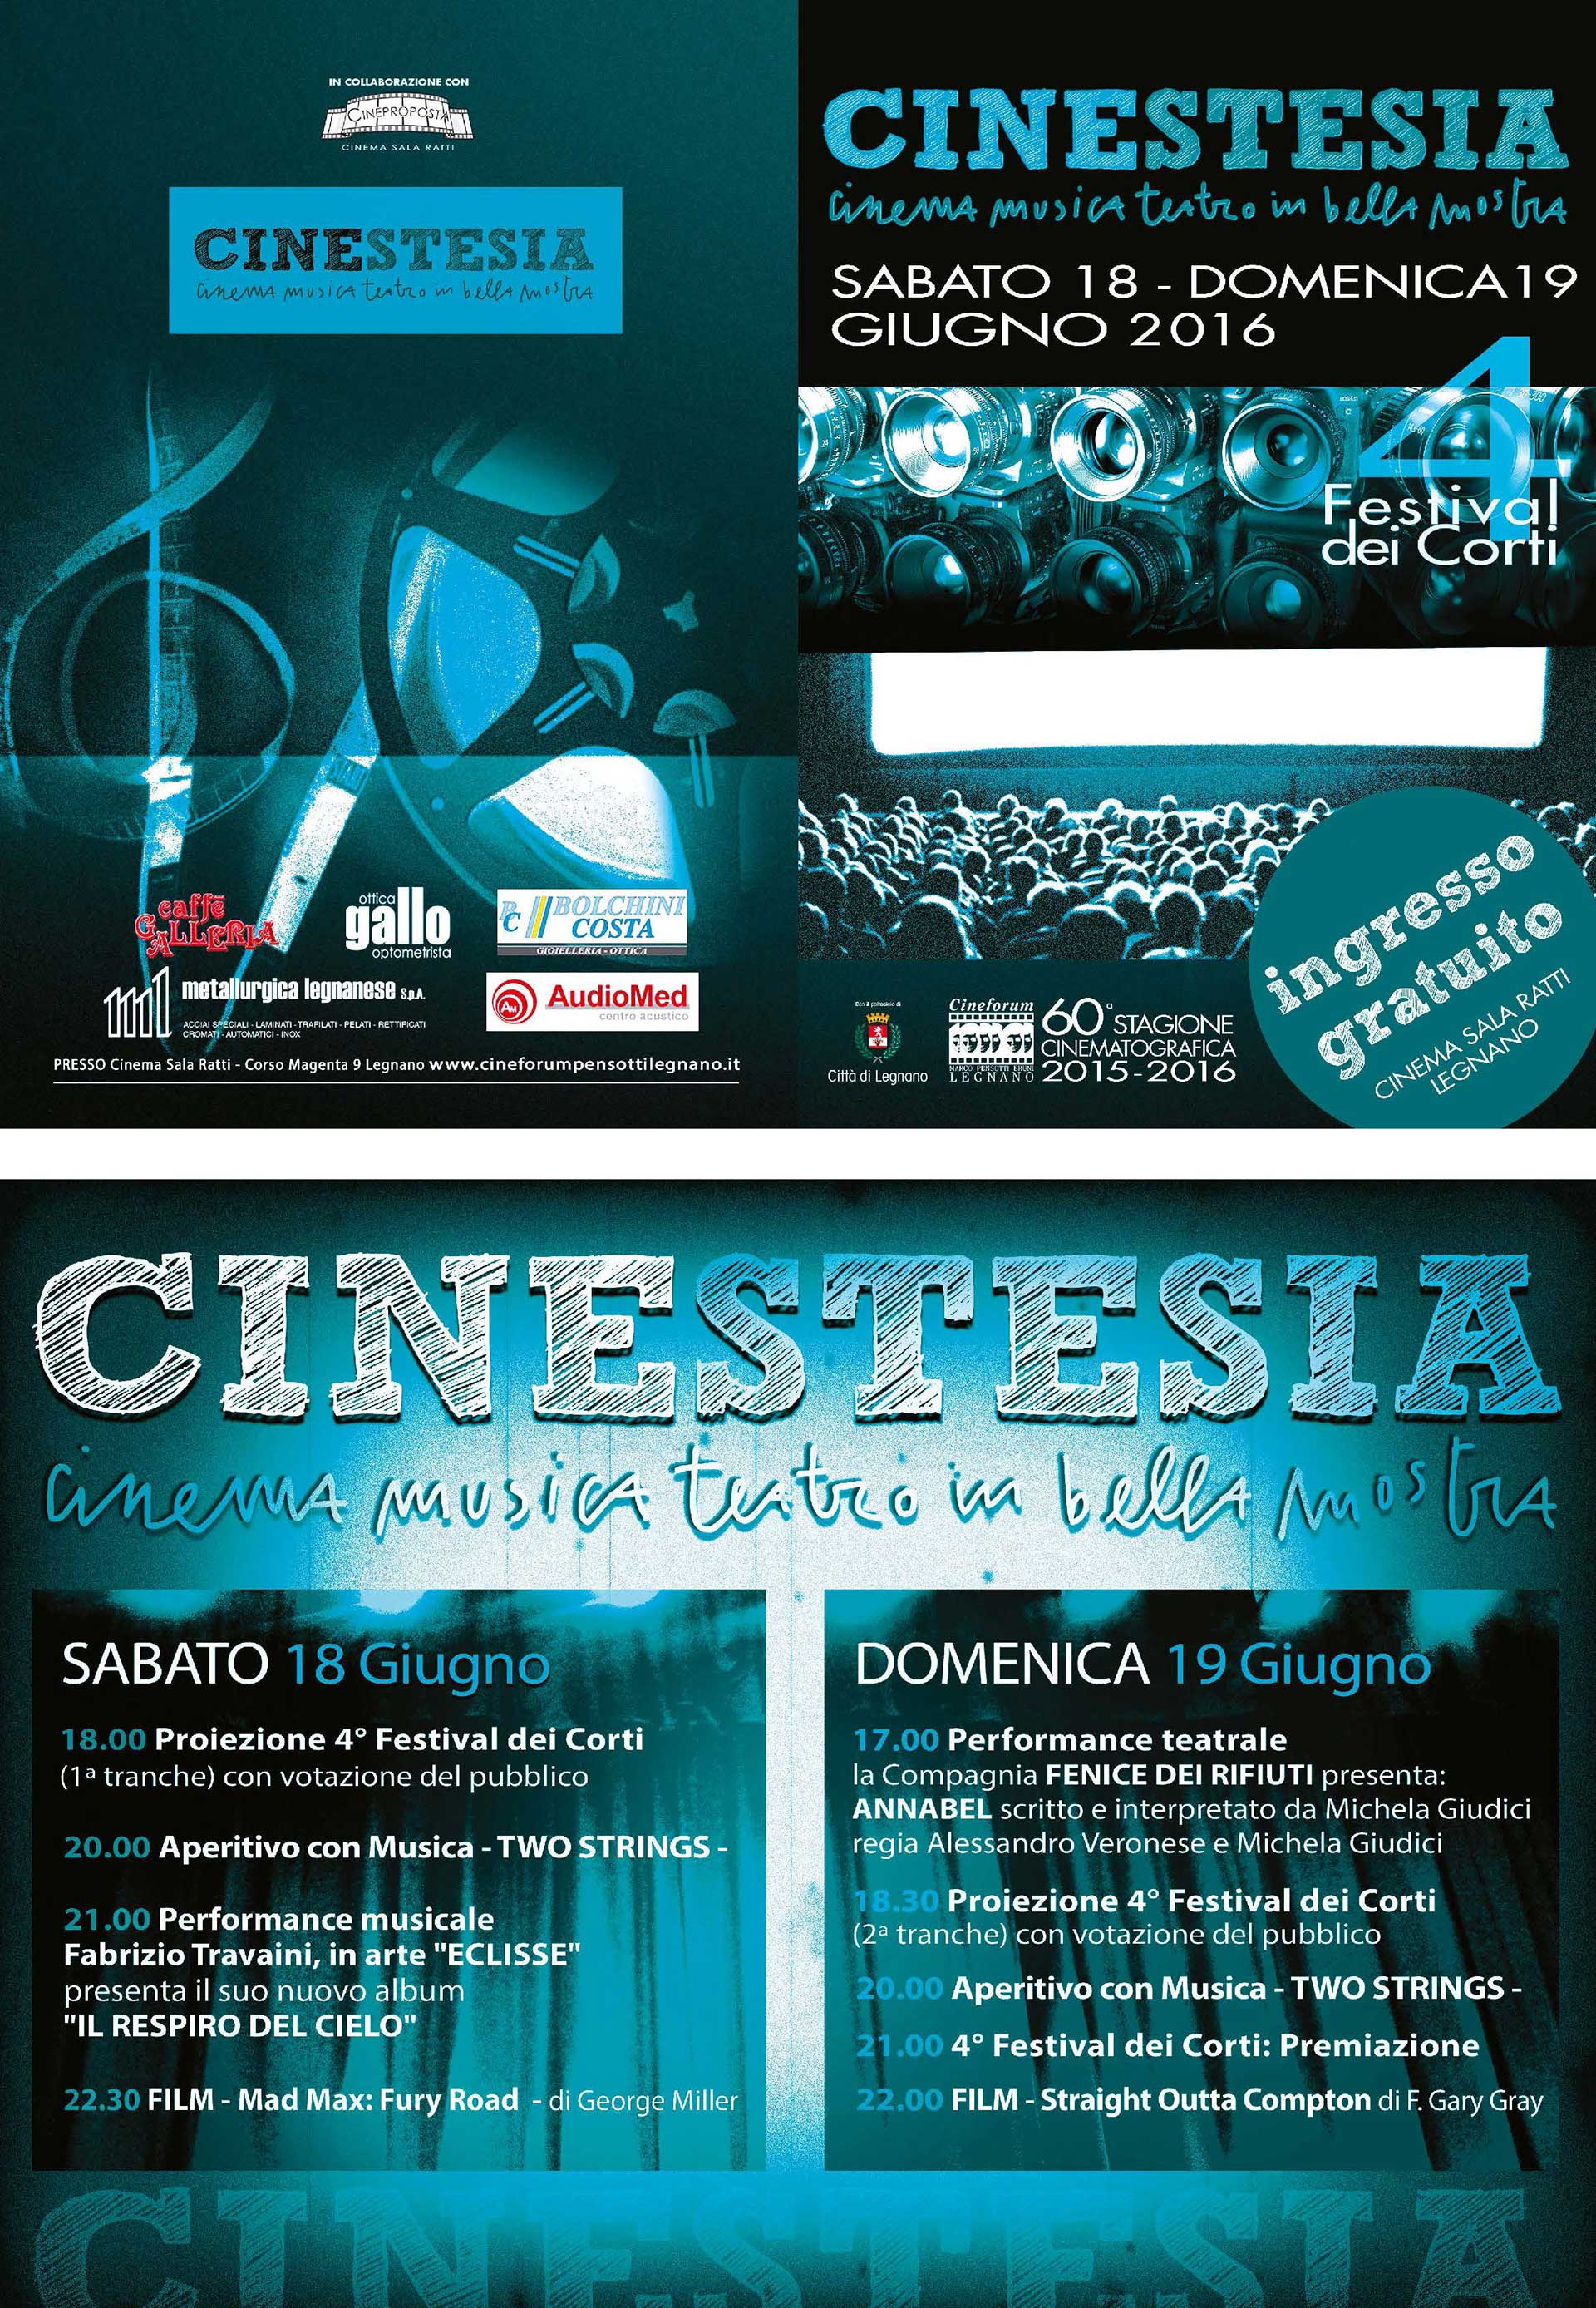 Cinestesia2016_Volantino_A4_F_R_bassa_Pagina_1-2